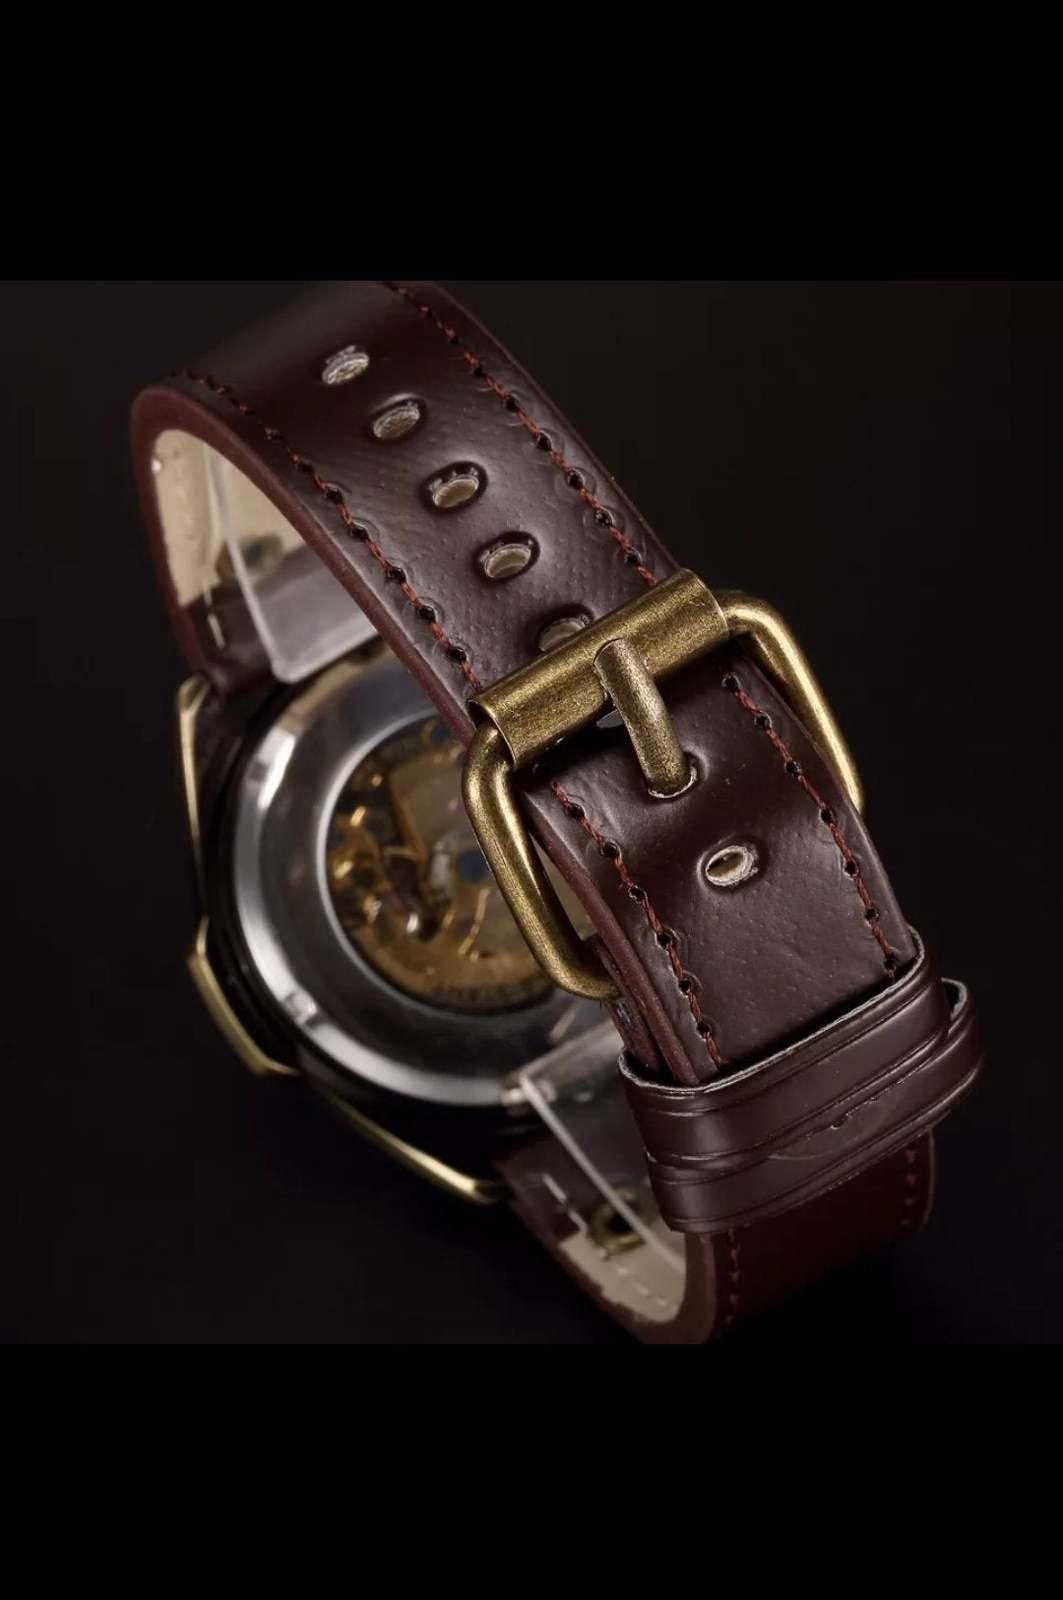 Luxury Vintage Retro Automatic Mechanical Watch- Automatics Self-Wind- Antique w image 5